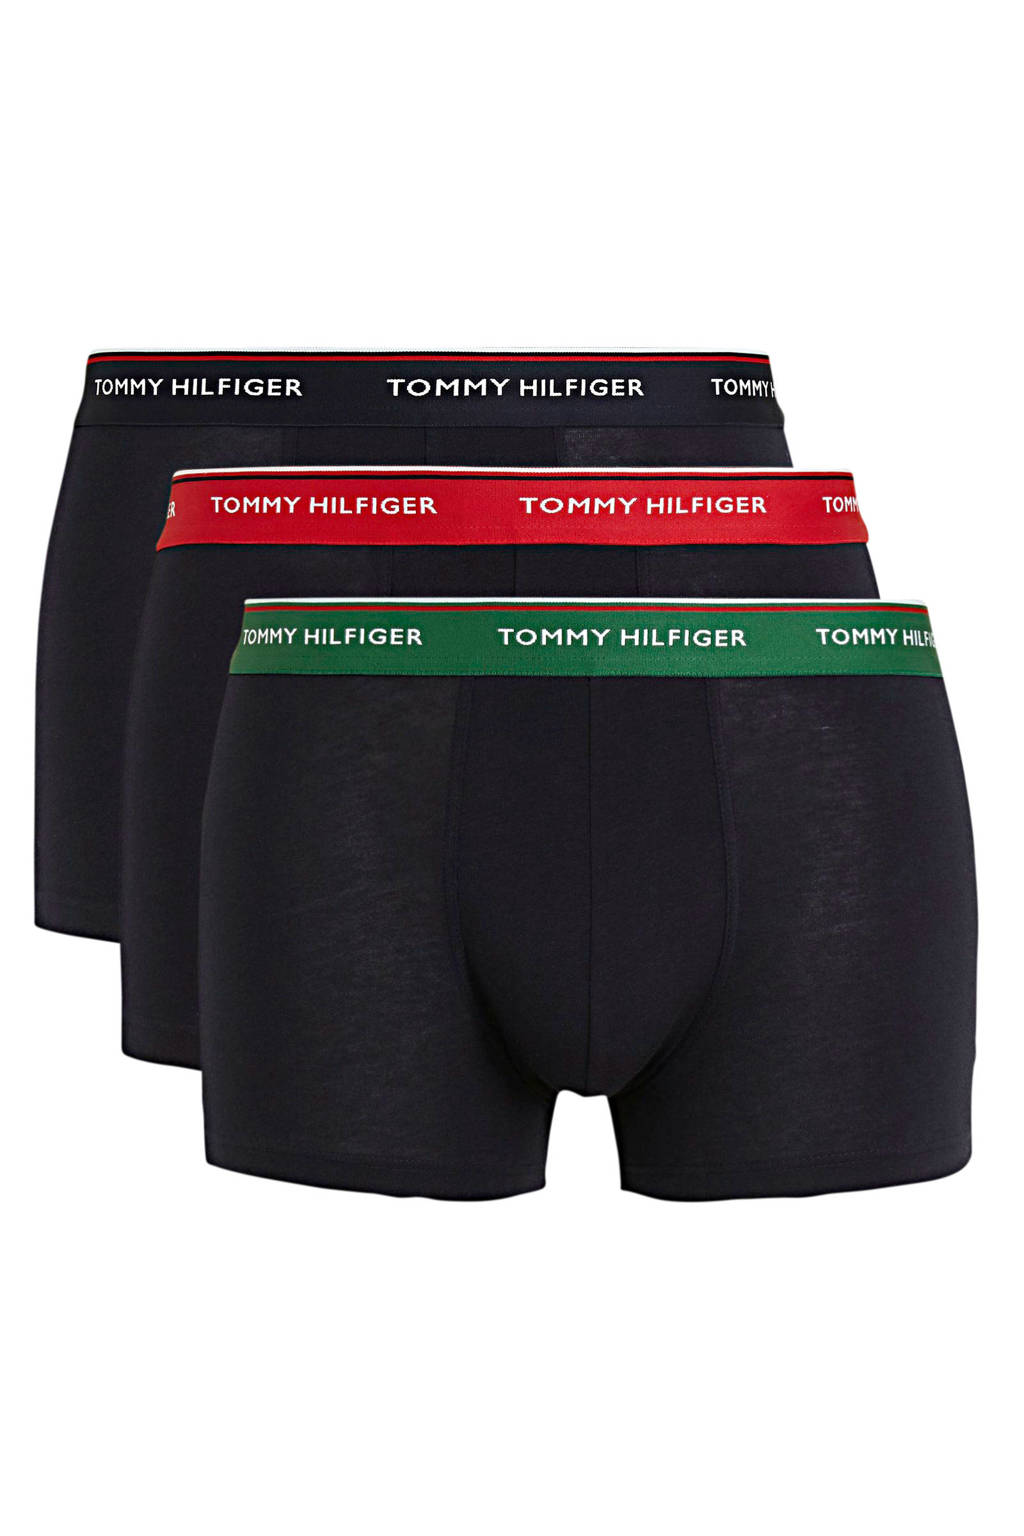 Tommy Hilfiger boxershort (set van 3), Zwart